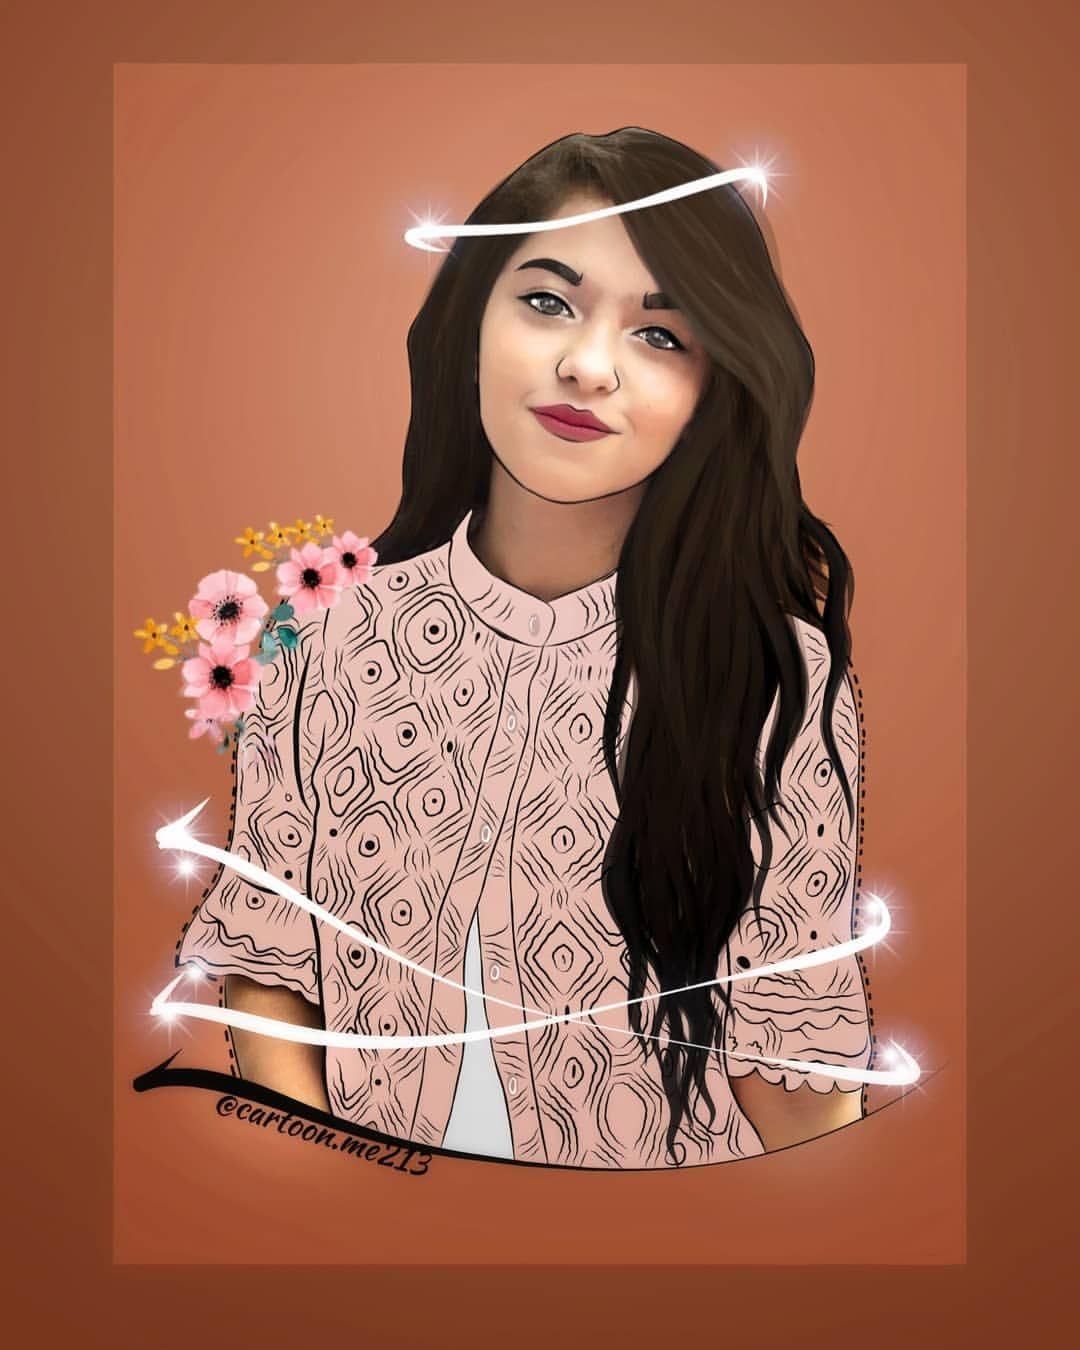 Instagram Profile Picture Cartoon : instagram, profile, picture, cartoon, Cartoon, 🇧🇩, @cartoon.me213, Instagram, Profile, Picdeer, Photography,, Dhaka,, Beautiful